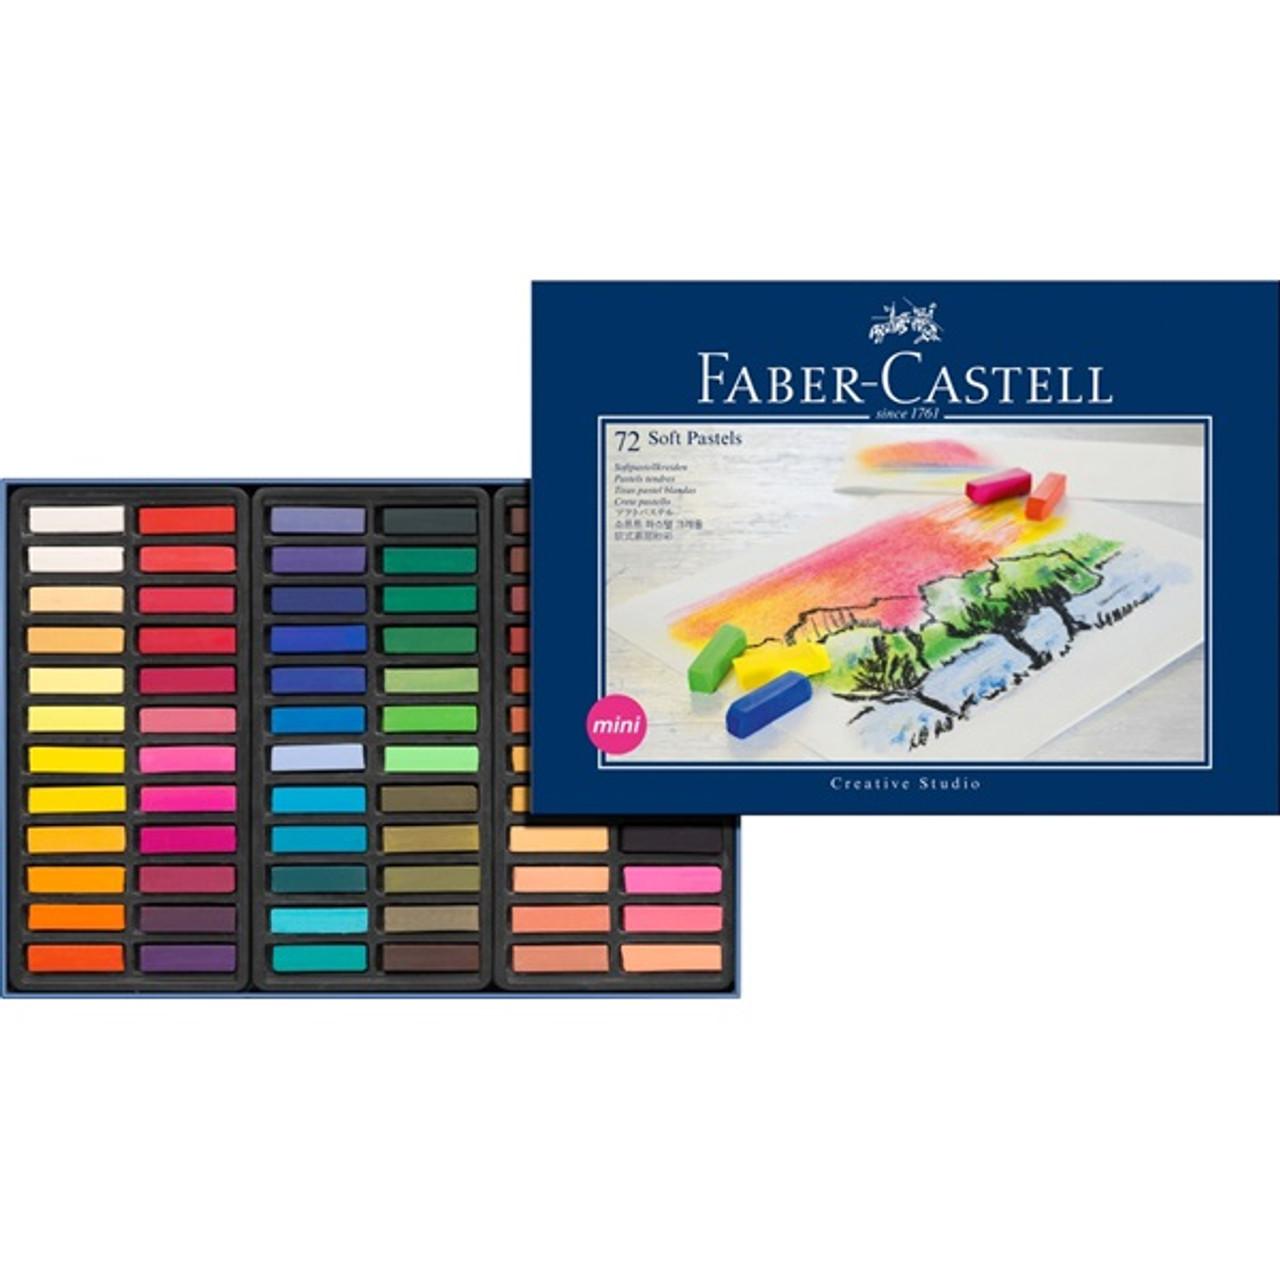 Creative Studio Soft Pastel 72pc Set